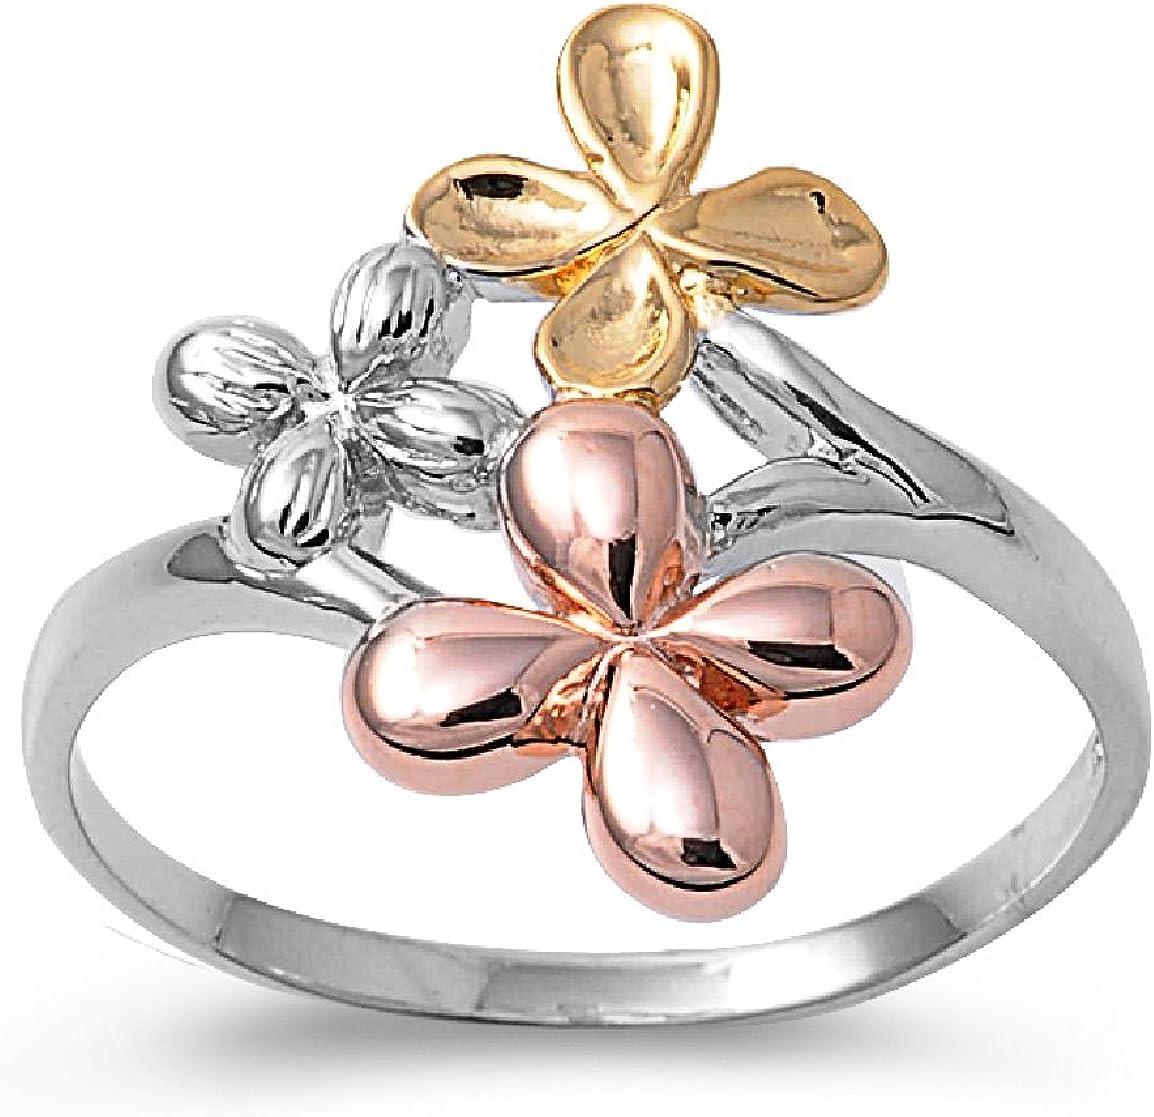 Princess Kylie 925 Sterling Silver Plumeria Ring